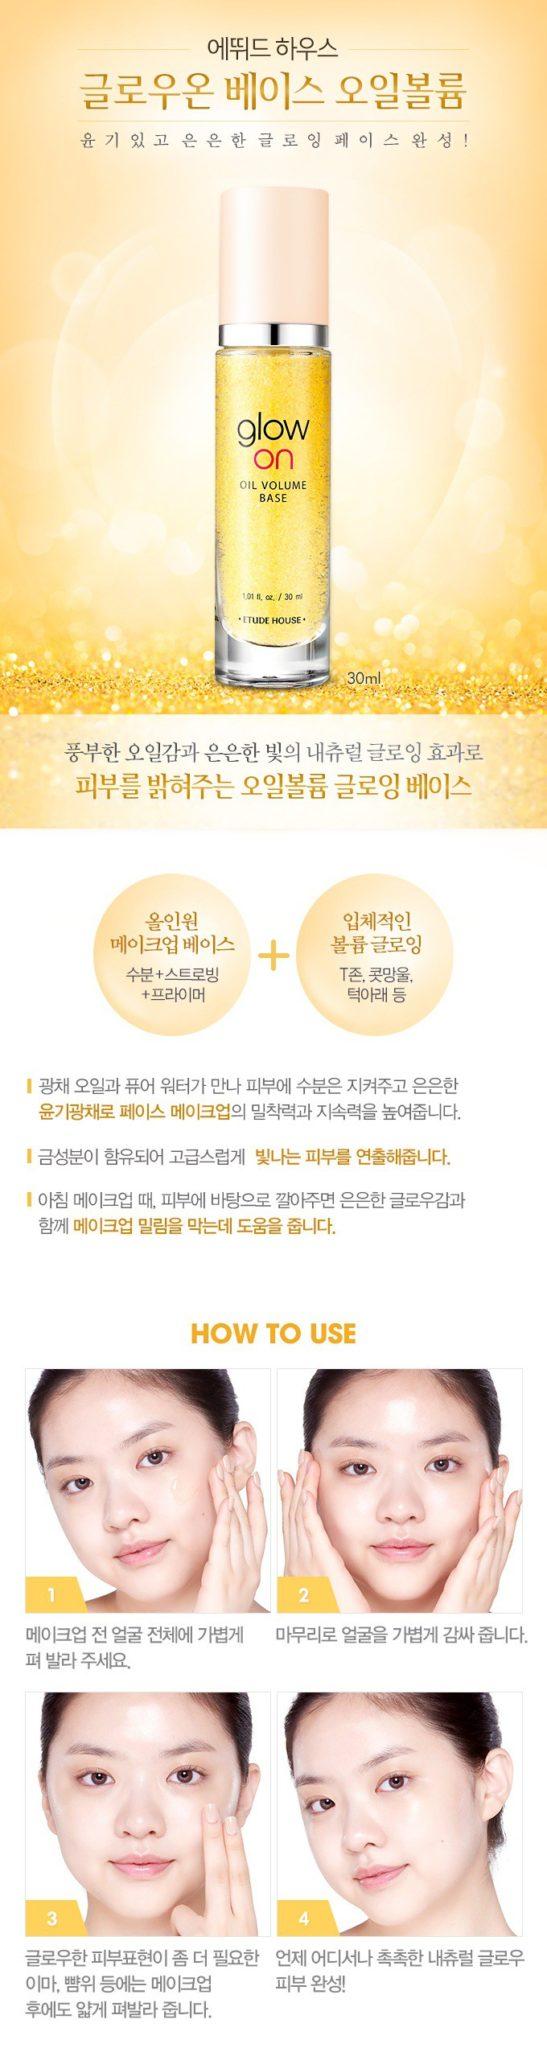 Etude House Glow On Oil Volume Base 30ml korean cosmetic makeup product online shop malaysia singapore thailand1